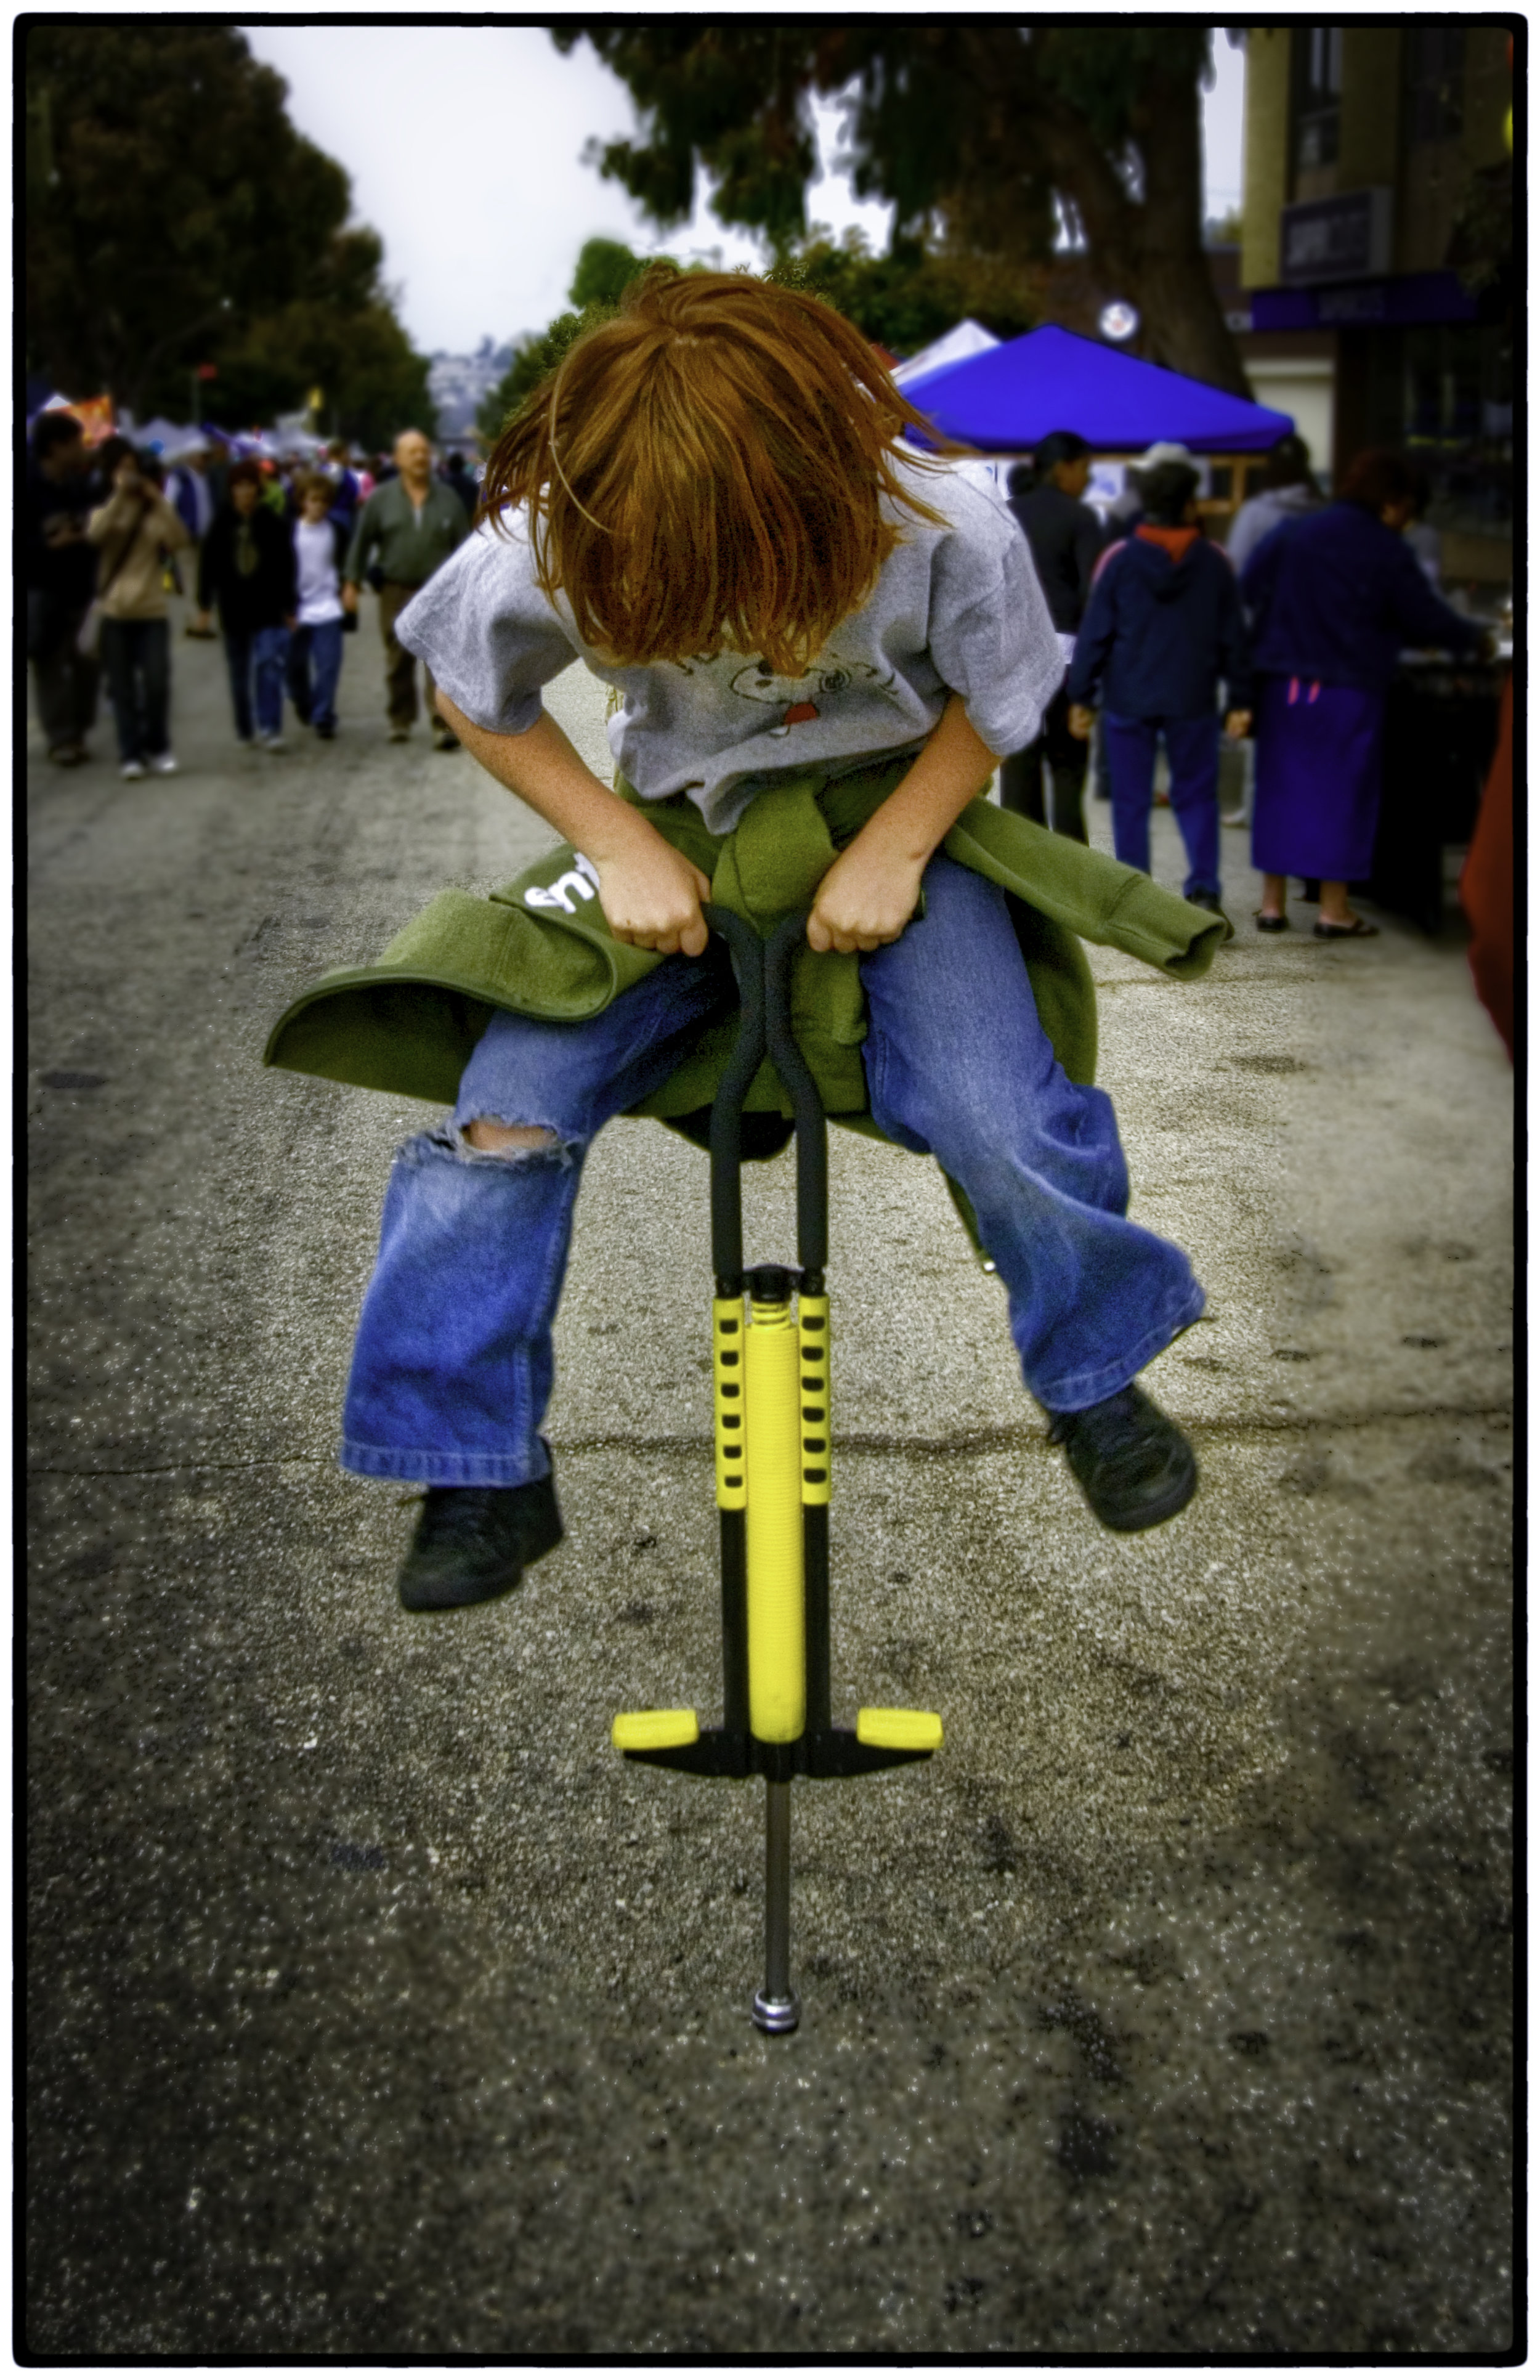 For me the fun is the people. Here's a kid on a pogo stick.